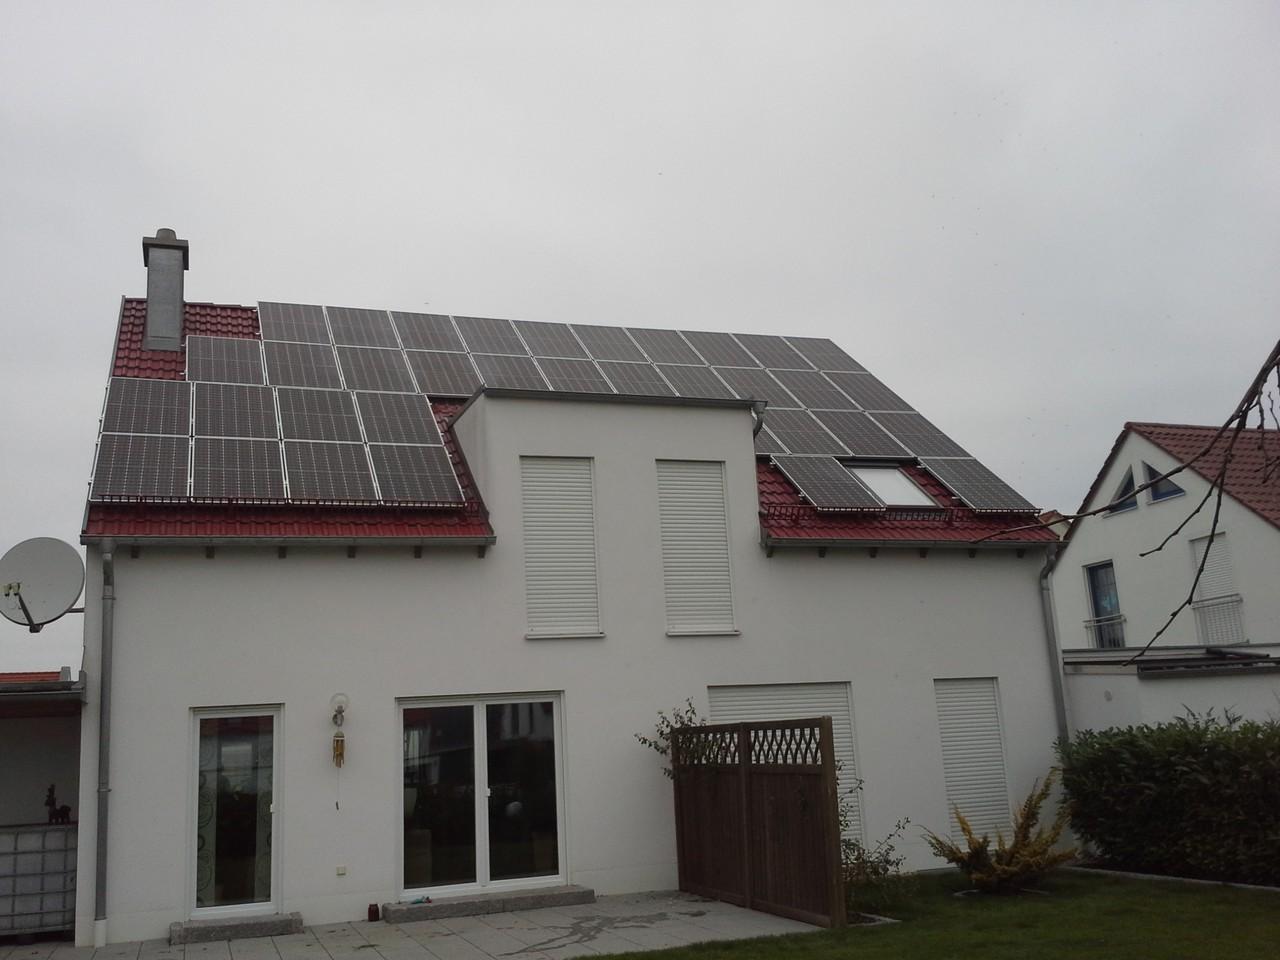 10 kWp in 93055 Burgweinting Bosch Solar